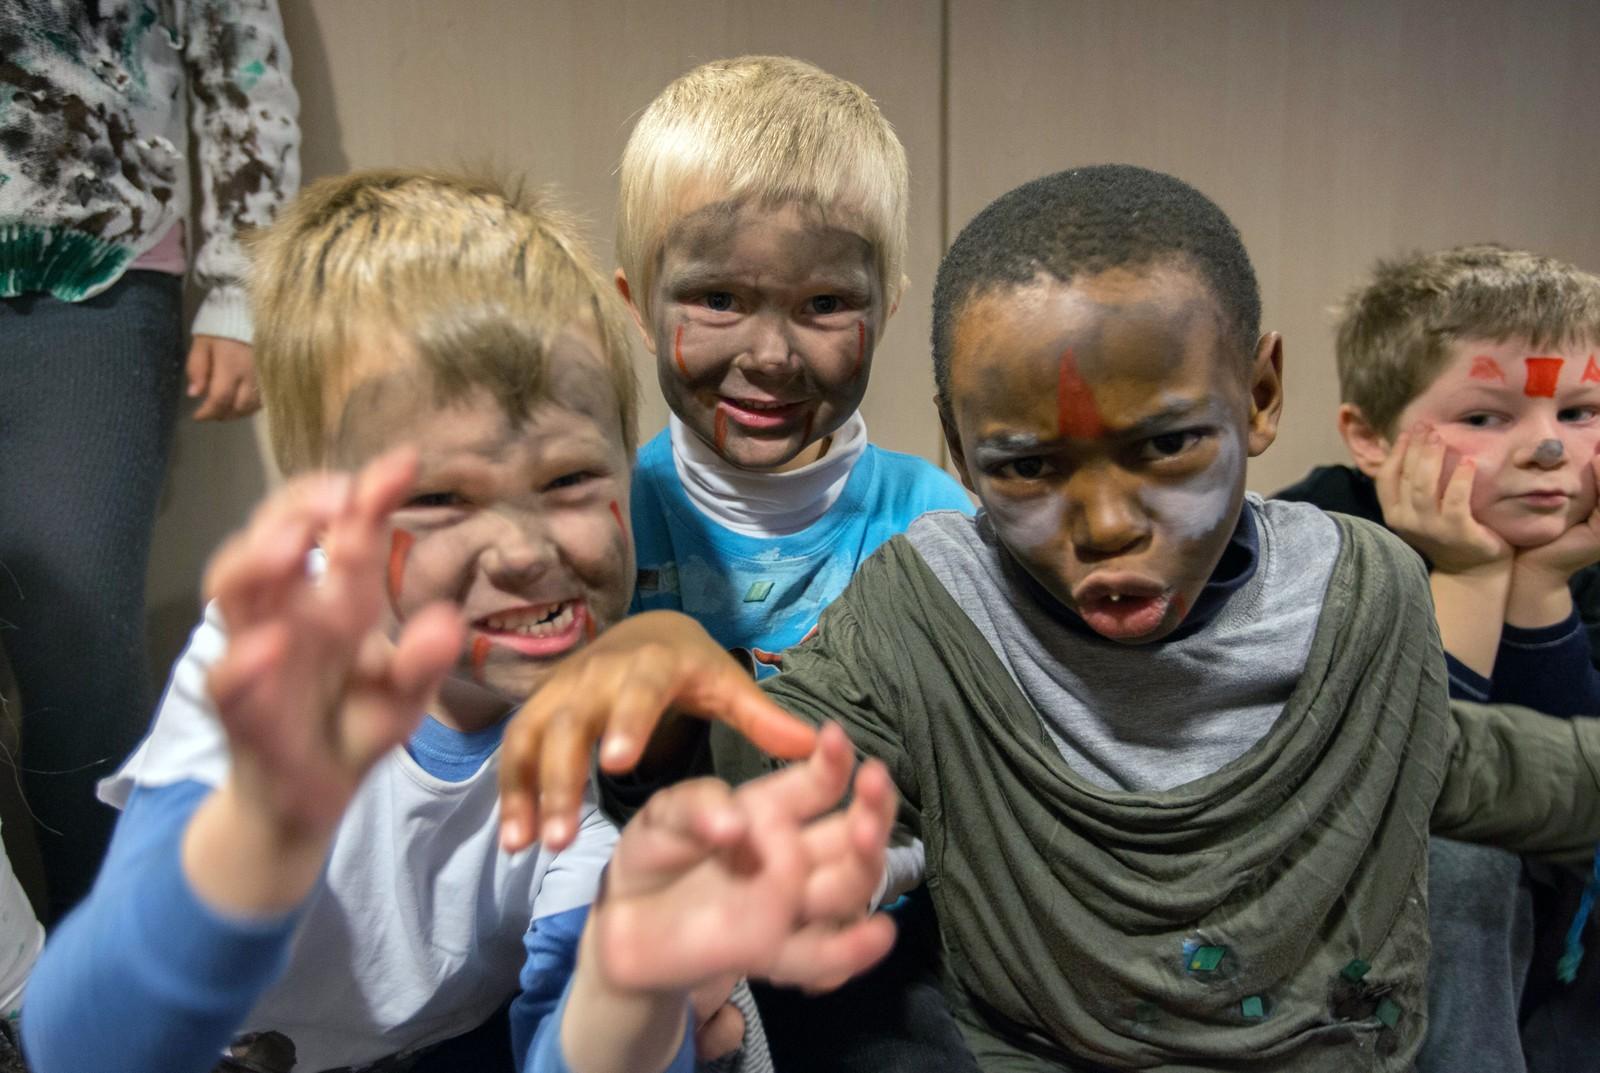 Elias Sunde, Leo Houland og Russel R. Ndah er skumle monstre i dag.